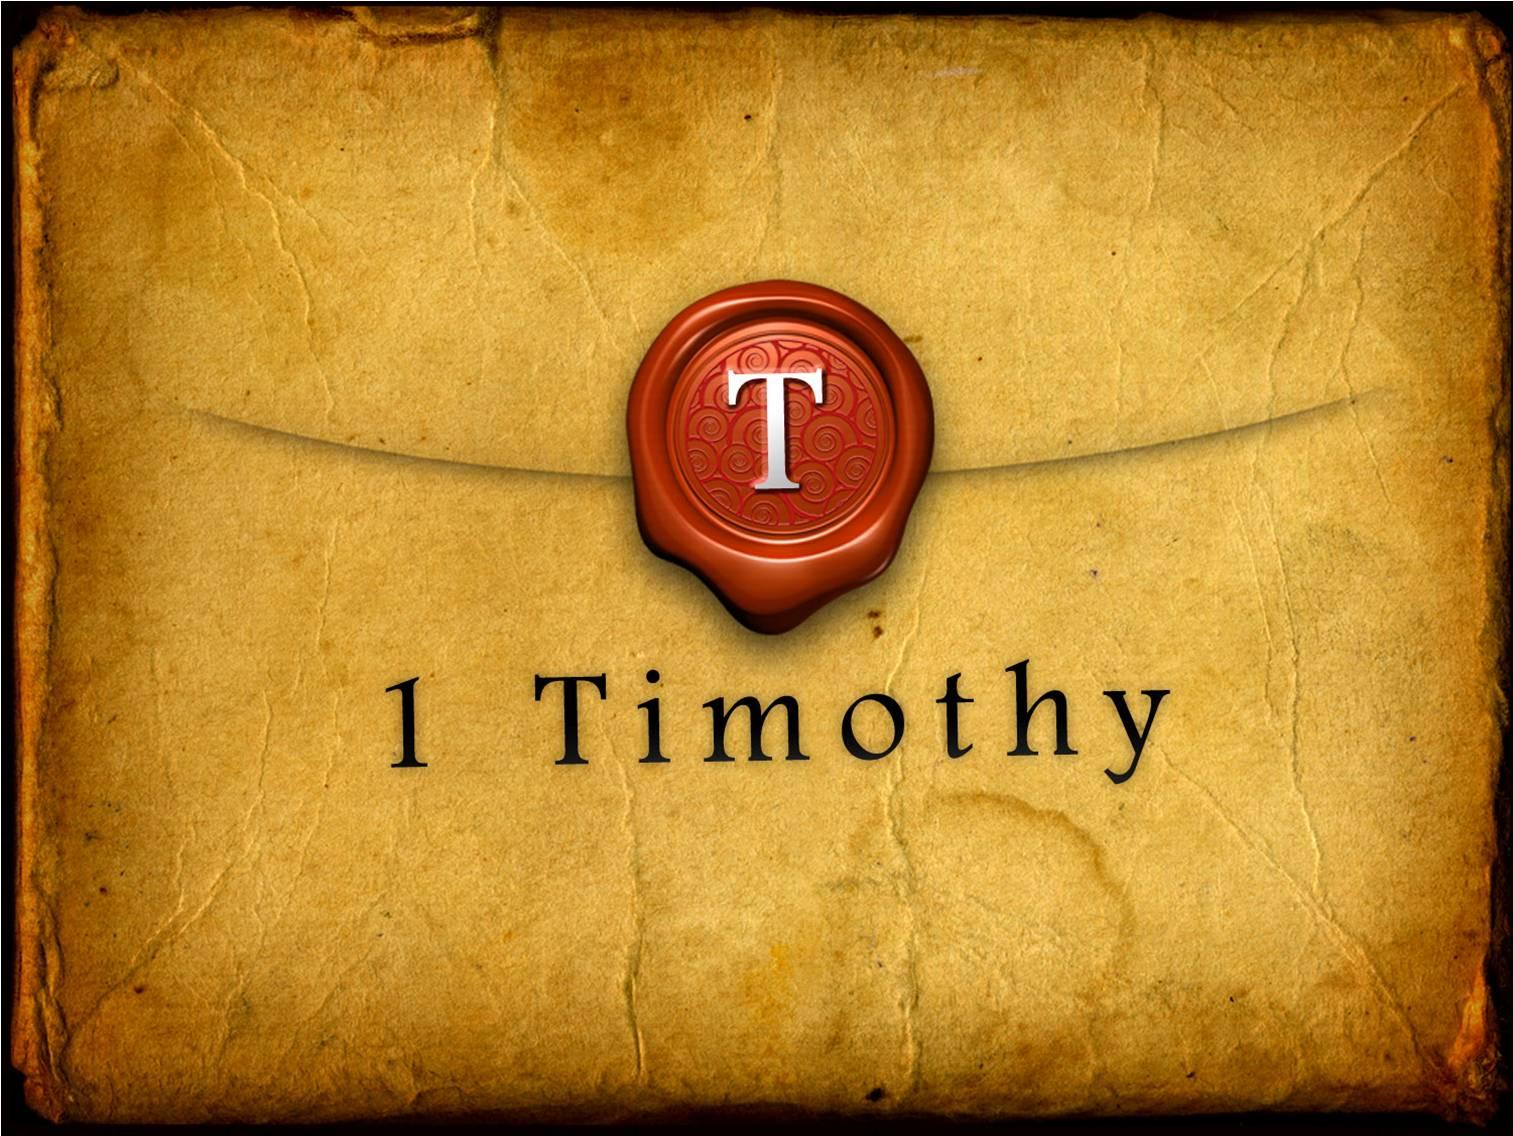 1Timothy